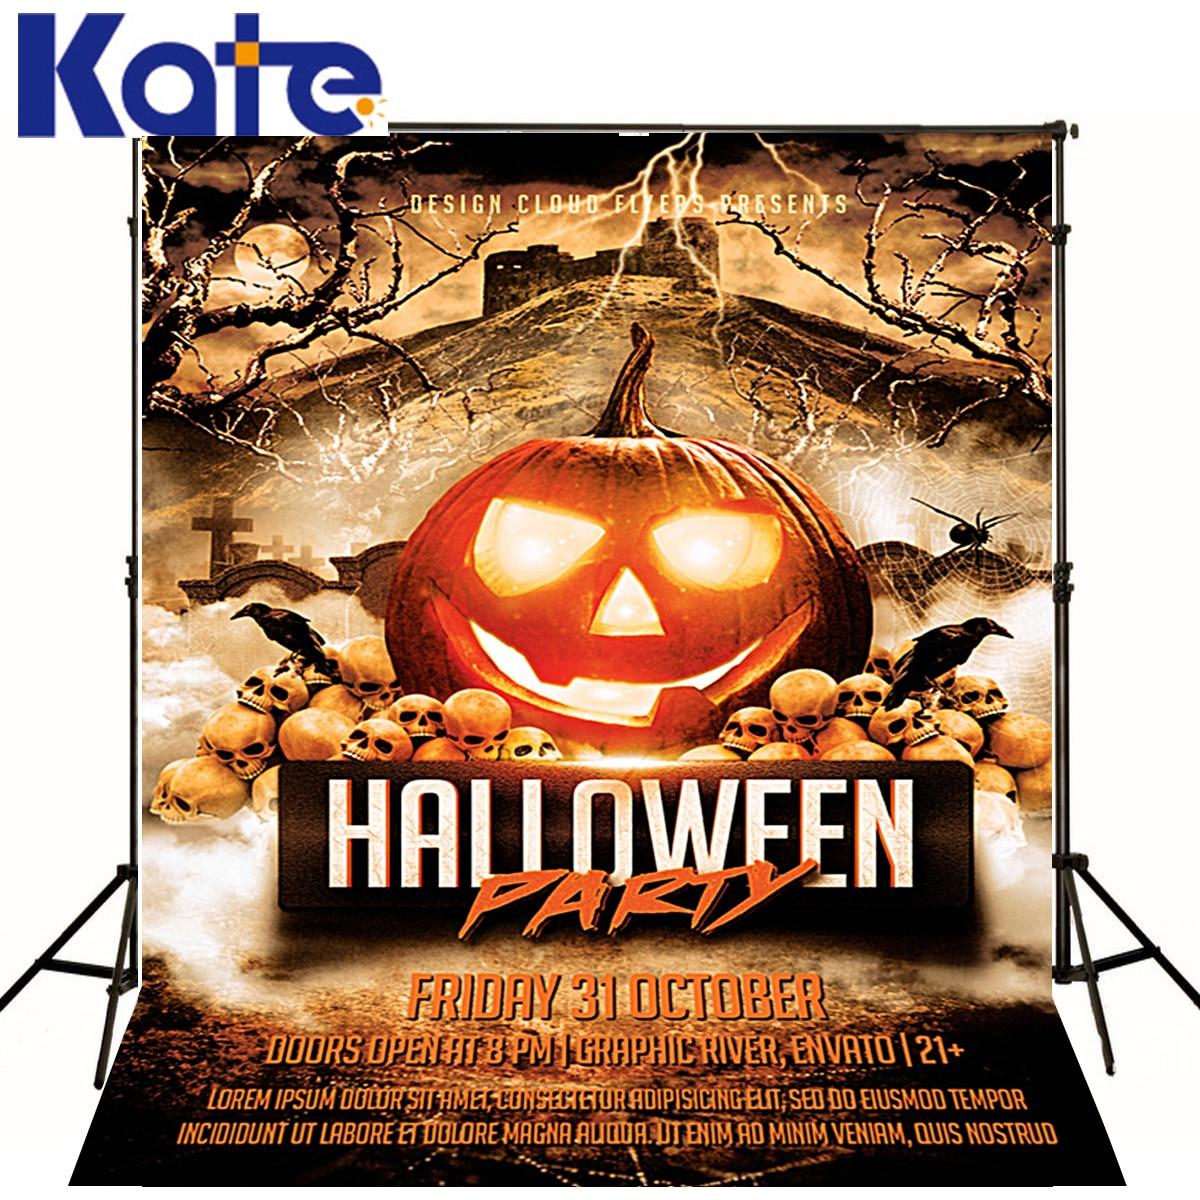 Photo Background Lantern Pumpkins  Photography Backdrops Halloween Skull Bat Castle For A Photo Shoot some pumpkins